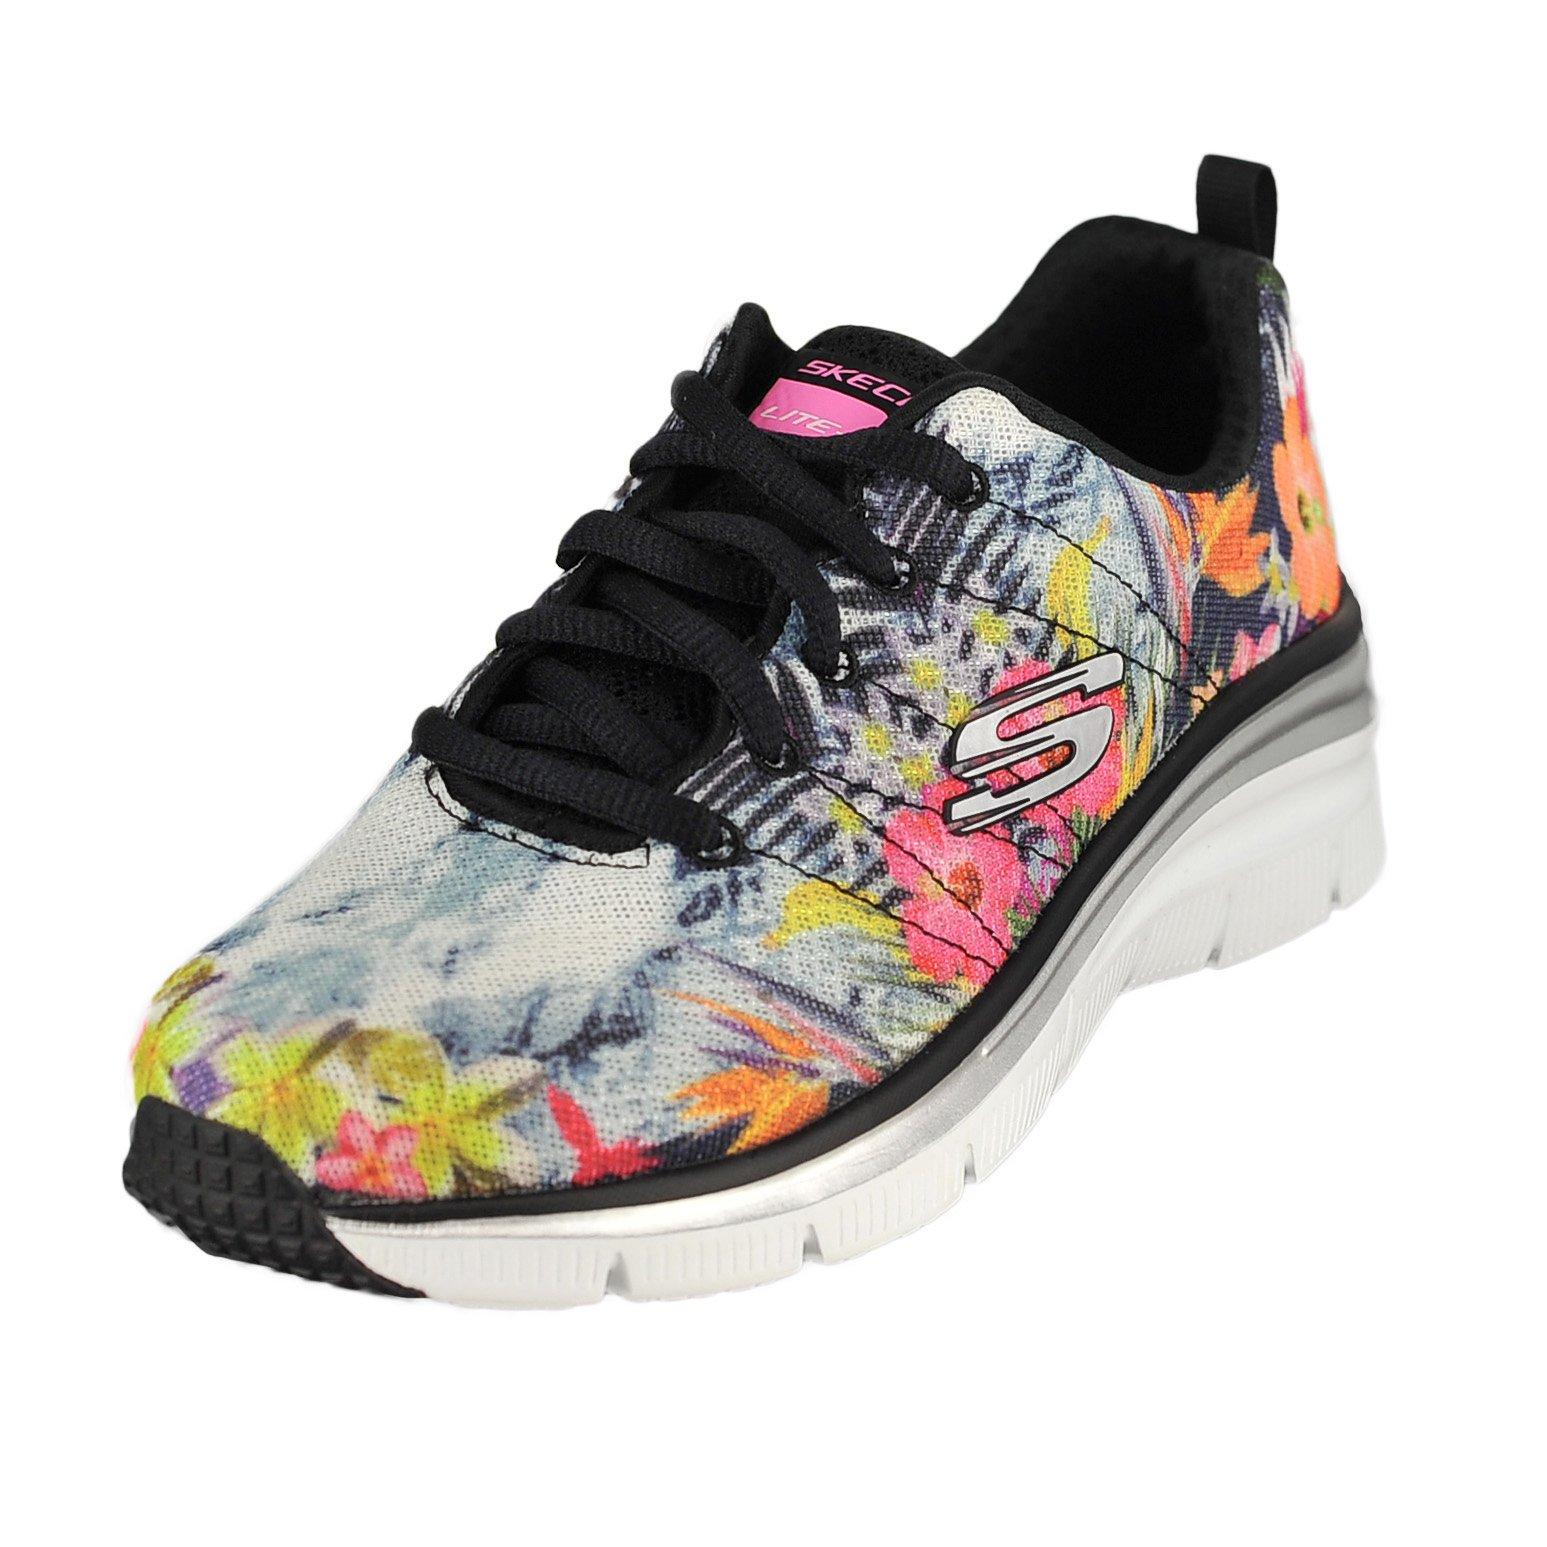 Skechers Sport Women's Fashion Fit Spring Essential Fashion Sneaker, Black/Multi, 7.5 M US